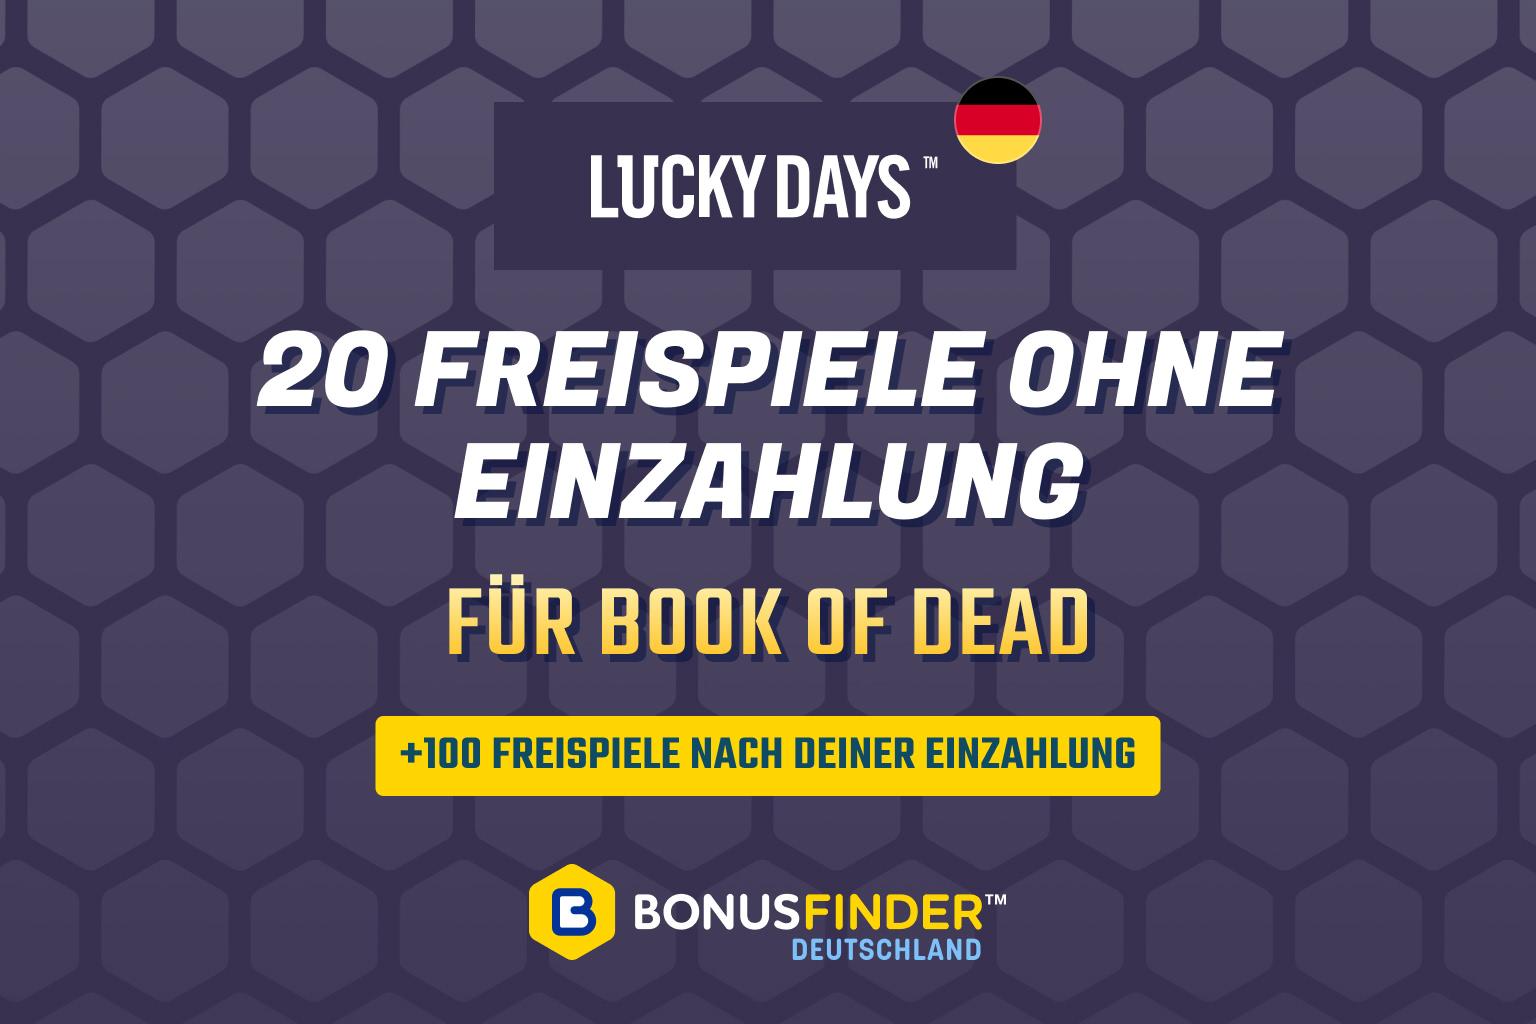 lucky days book of dead freispiele